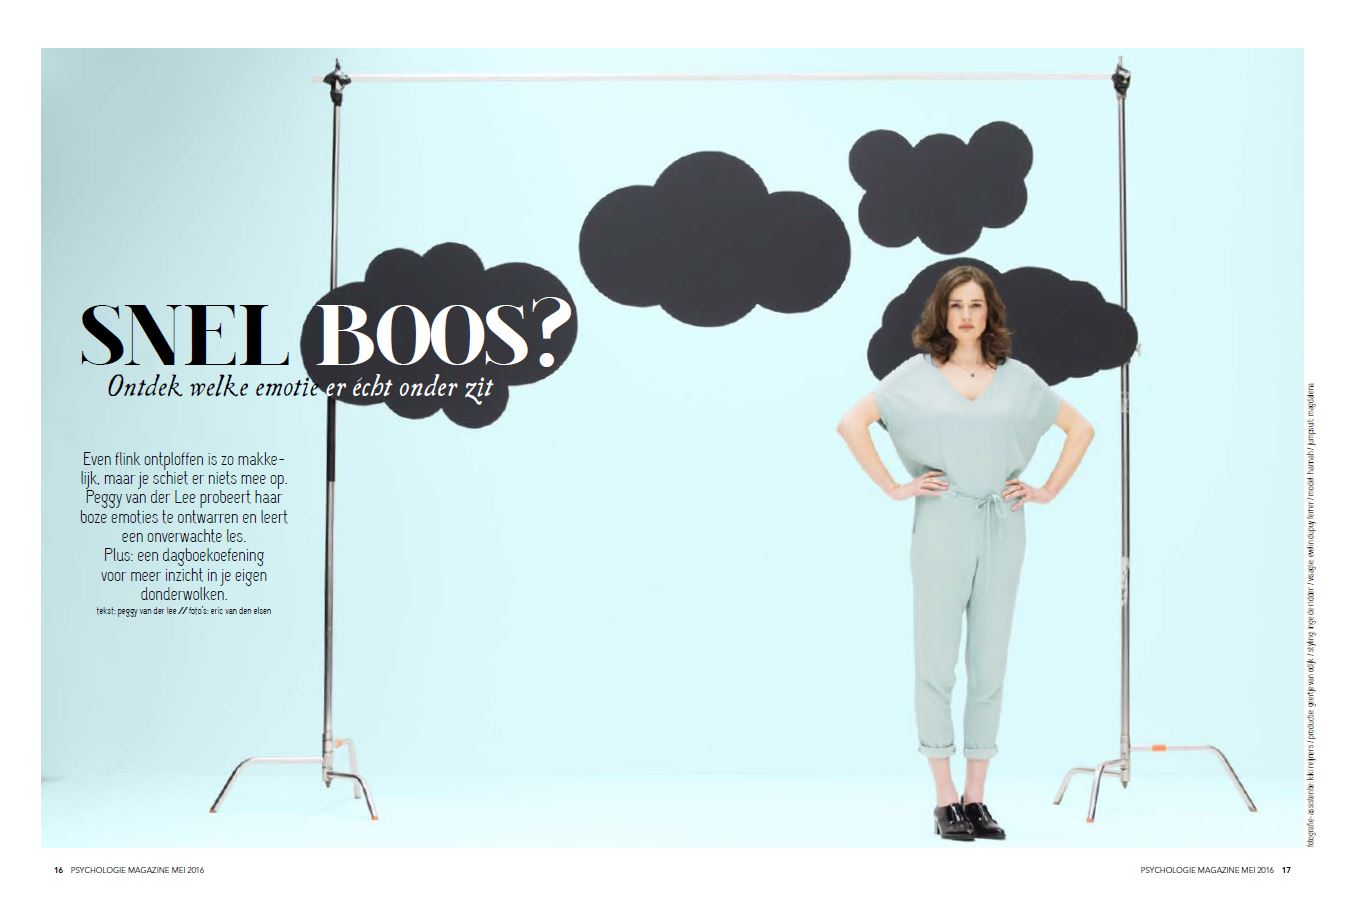 Boosheid - Psychologie Magazine